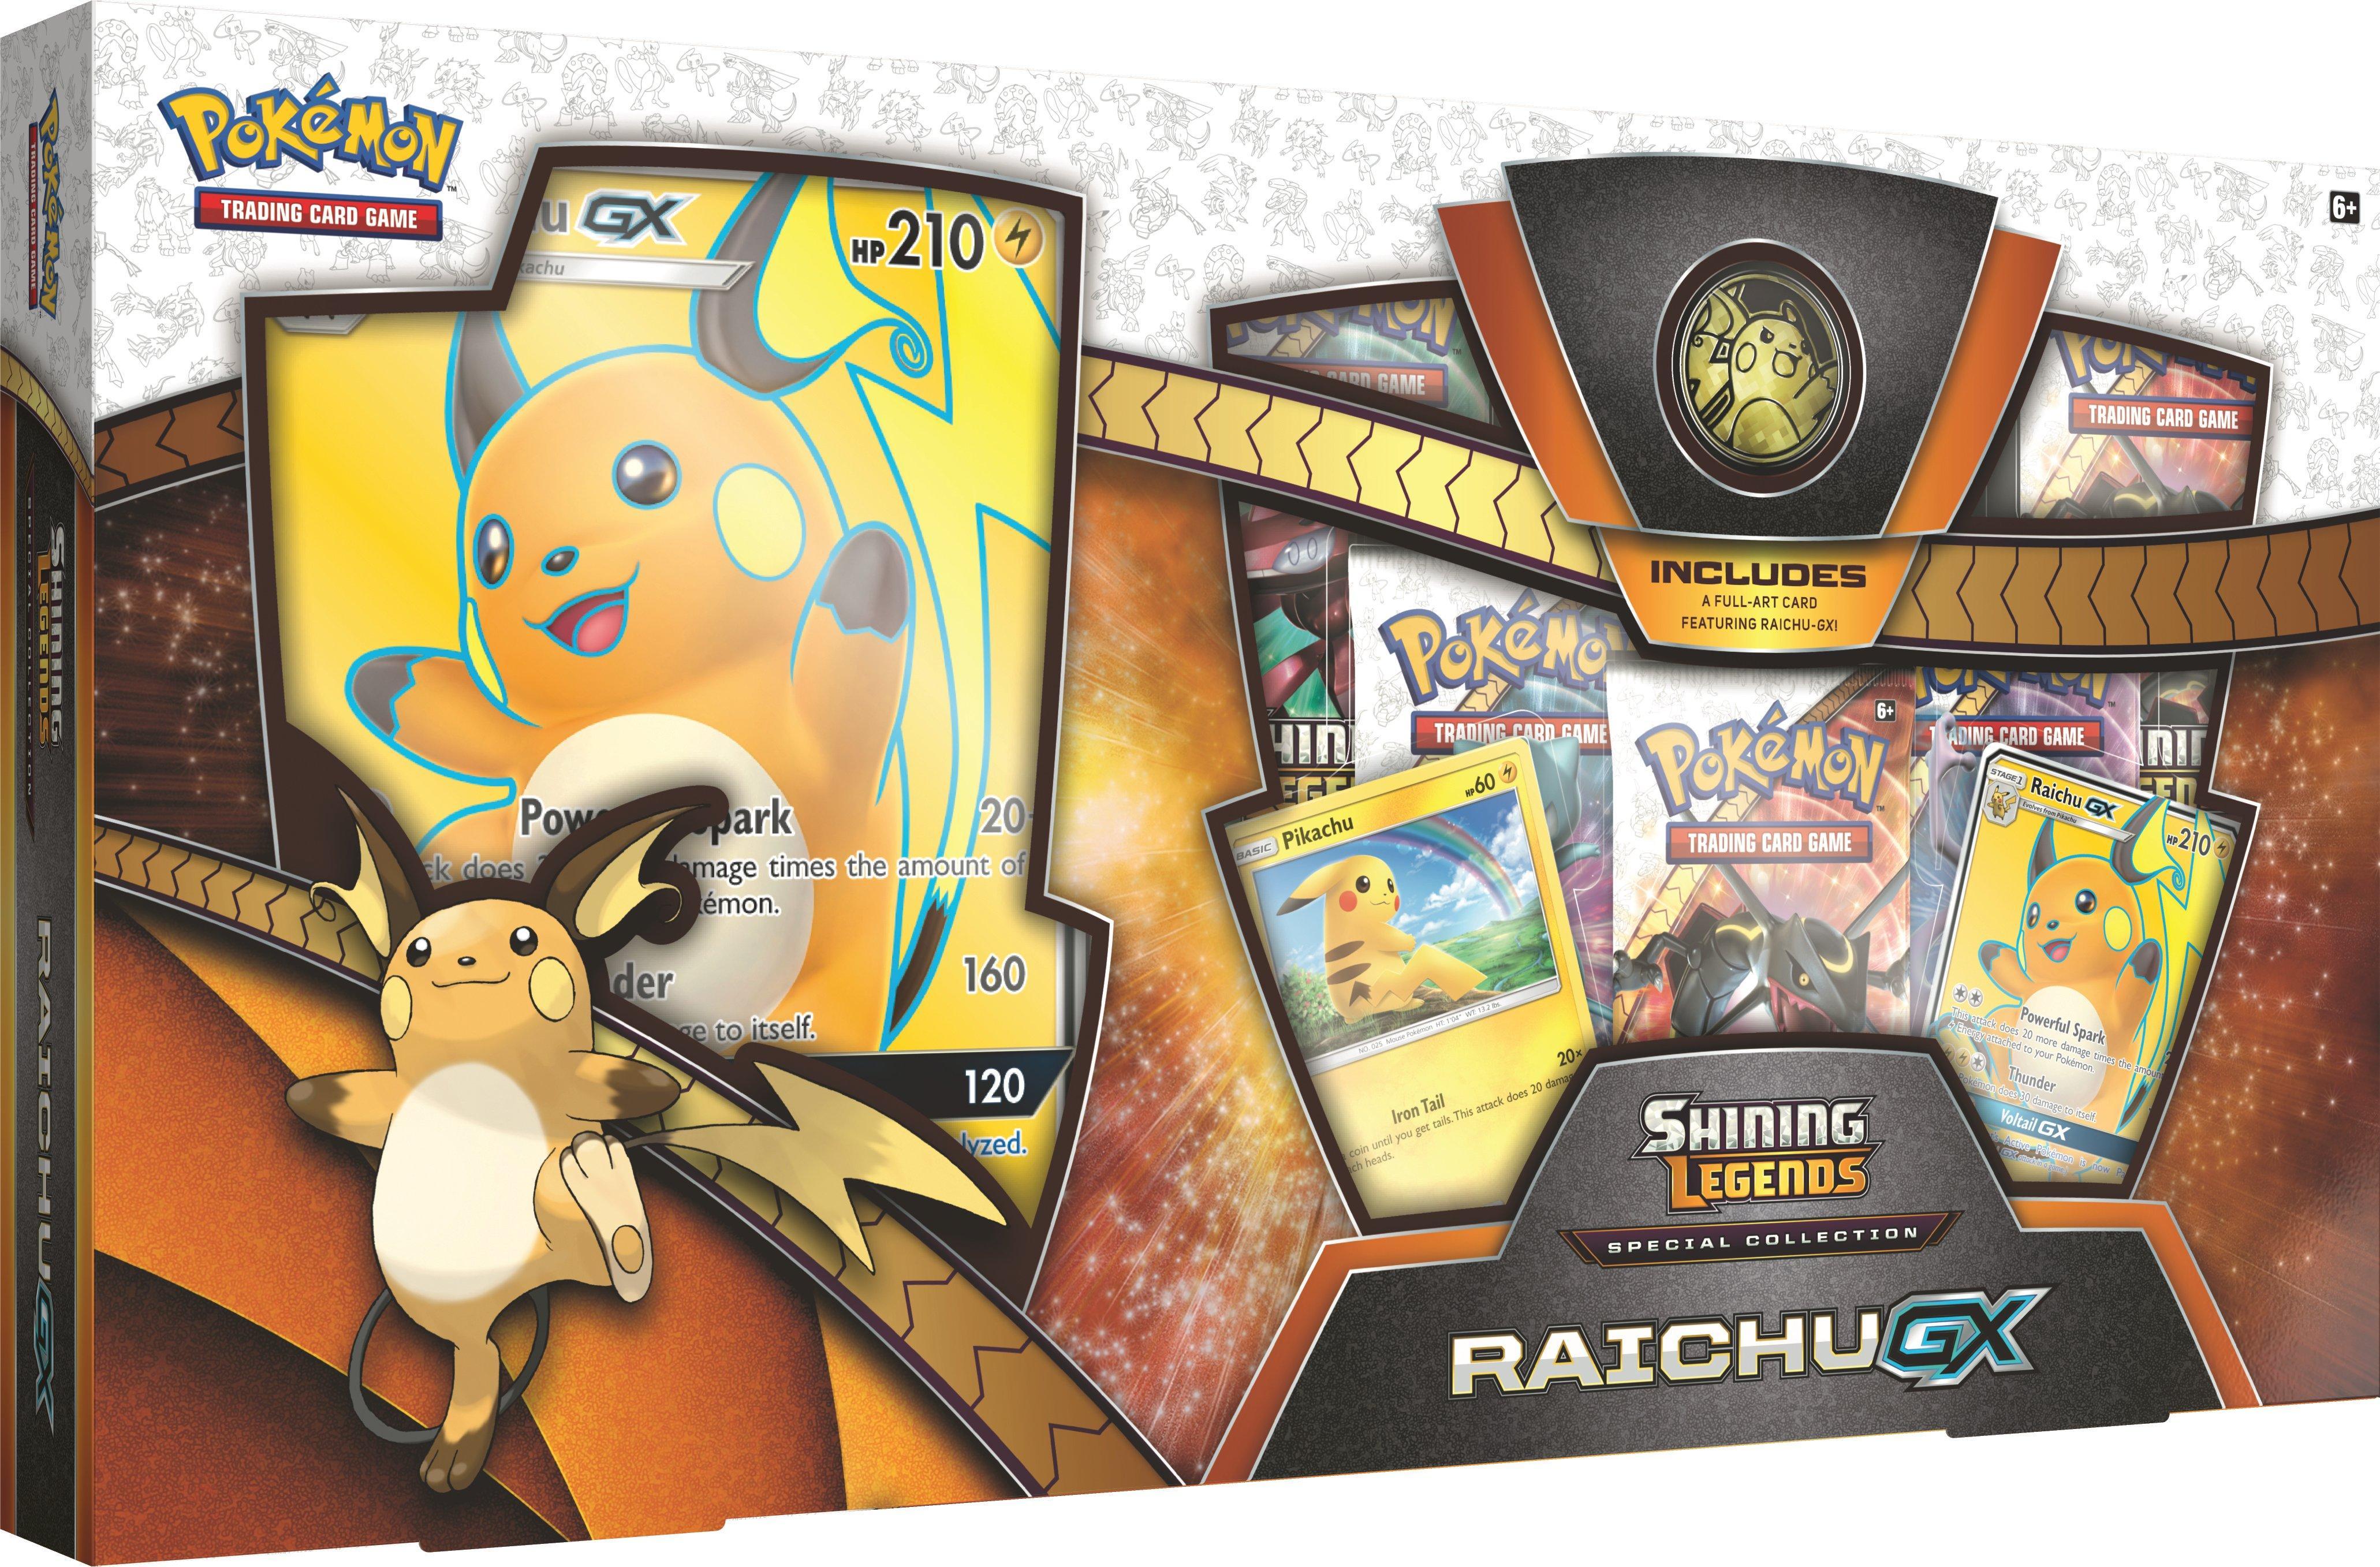 Pokemon Trading Card Game Shining Legends Raichu Gx Special